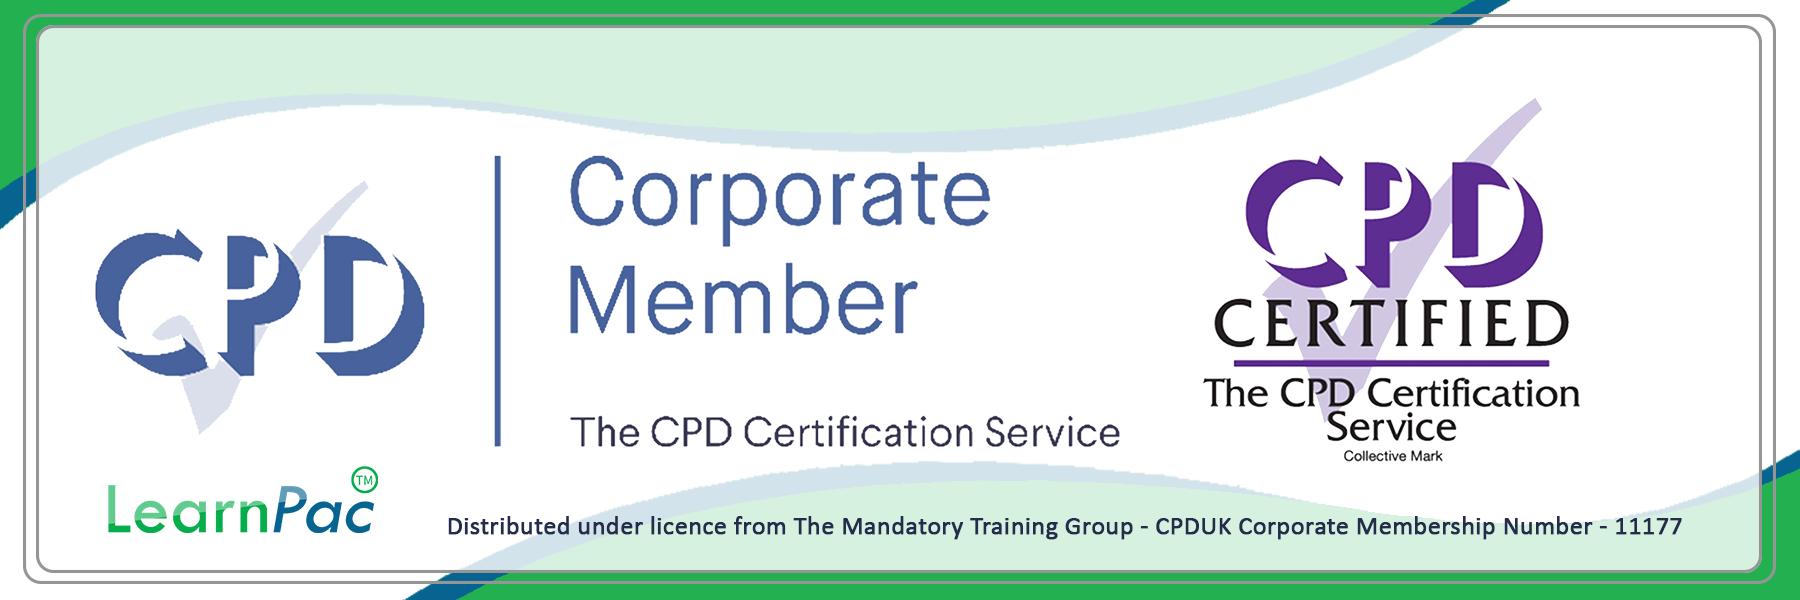 Care Certificate Standard 5 - CPDUK Certified - Learnpac System UK -